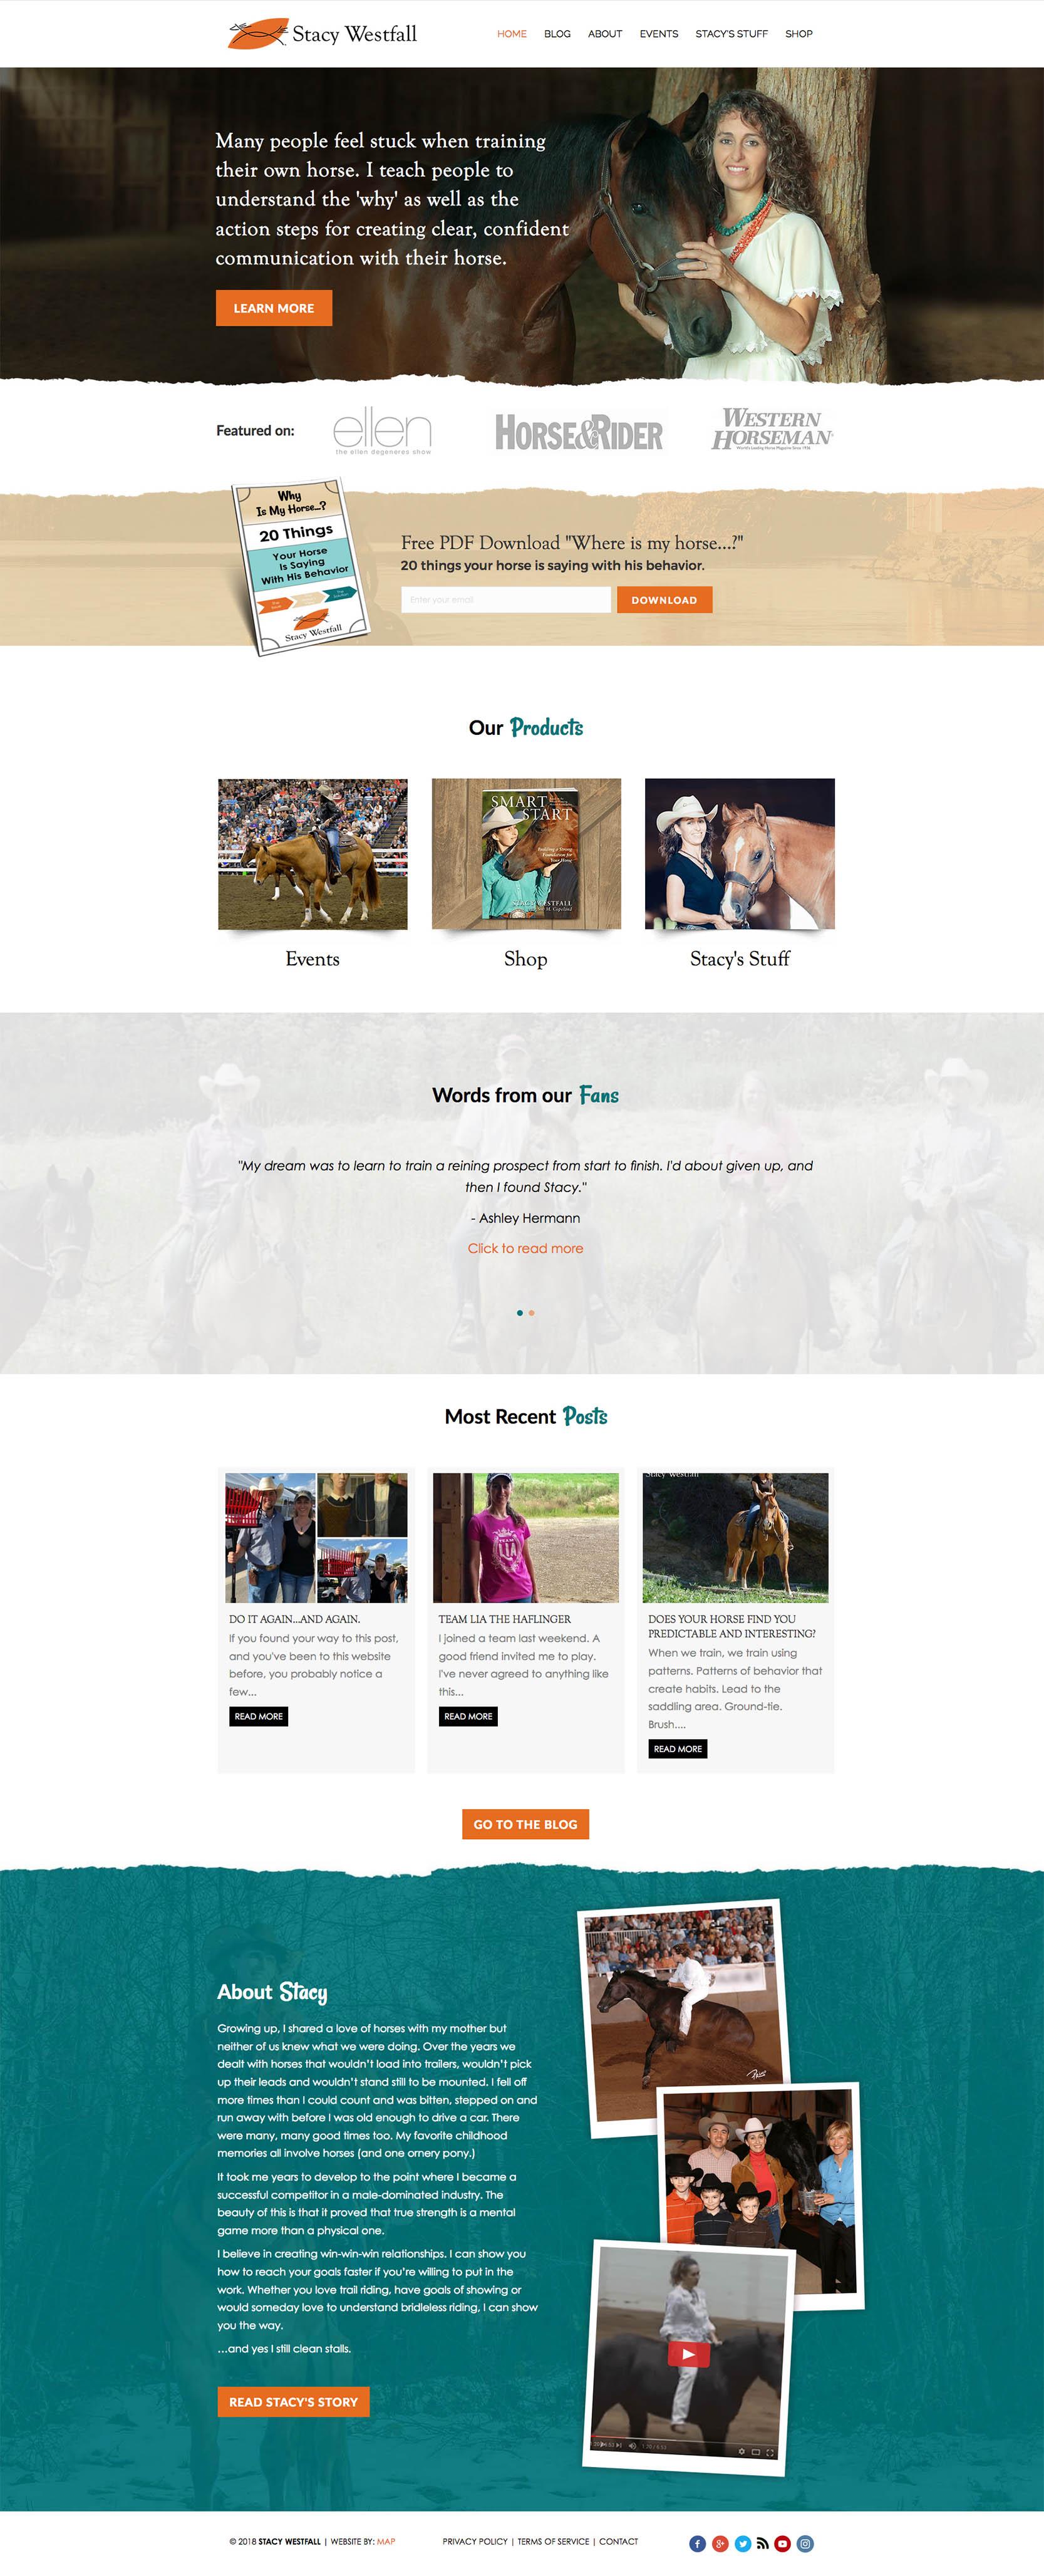 Stacy Westfall Homepage